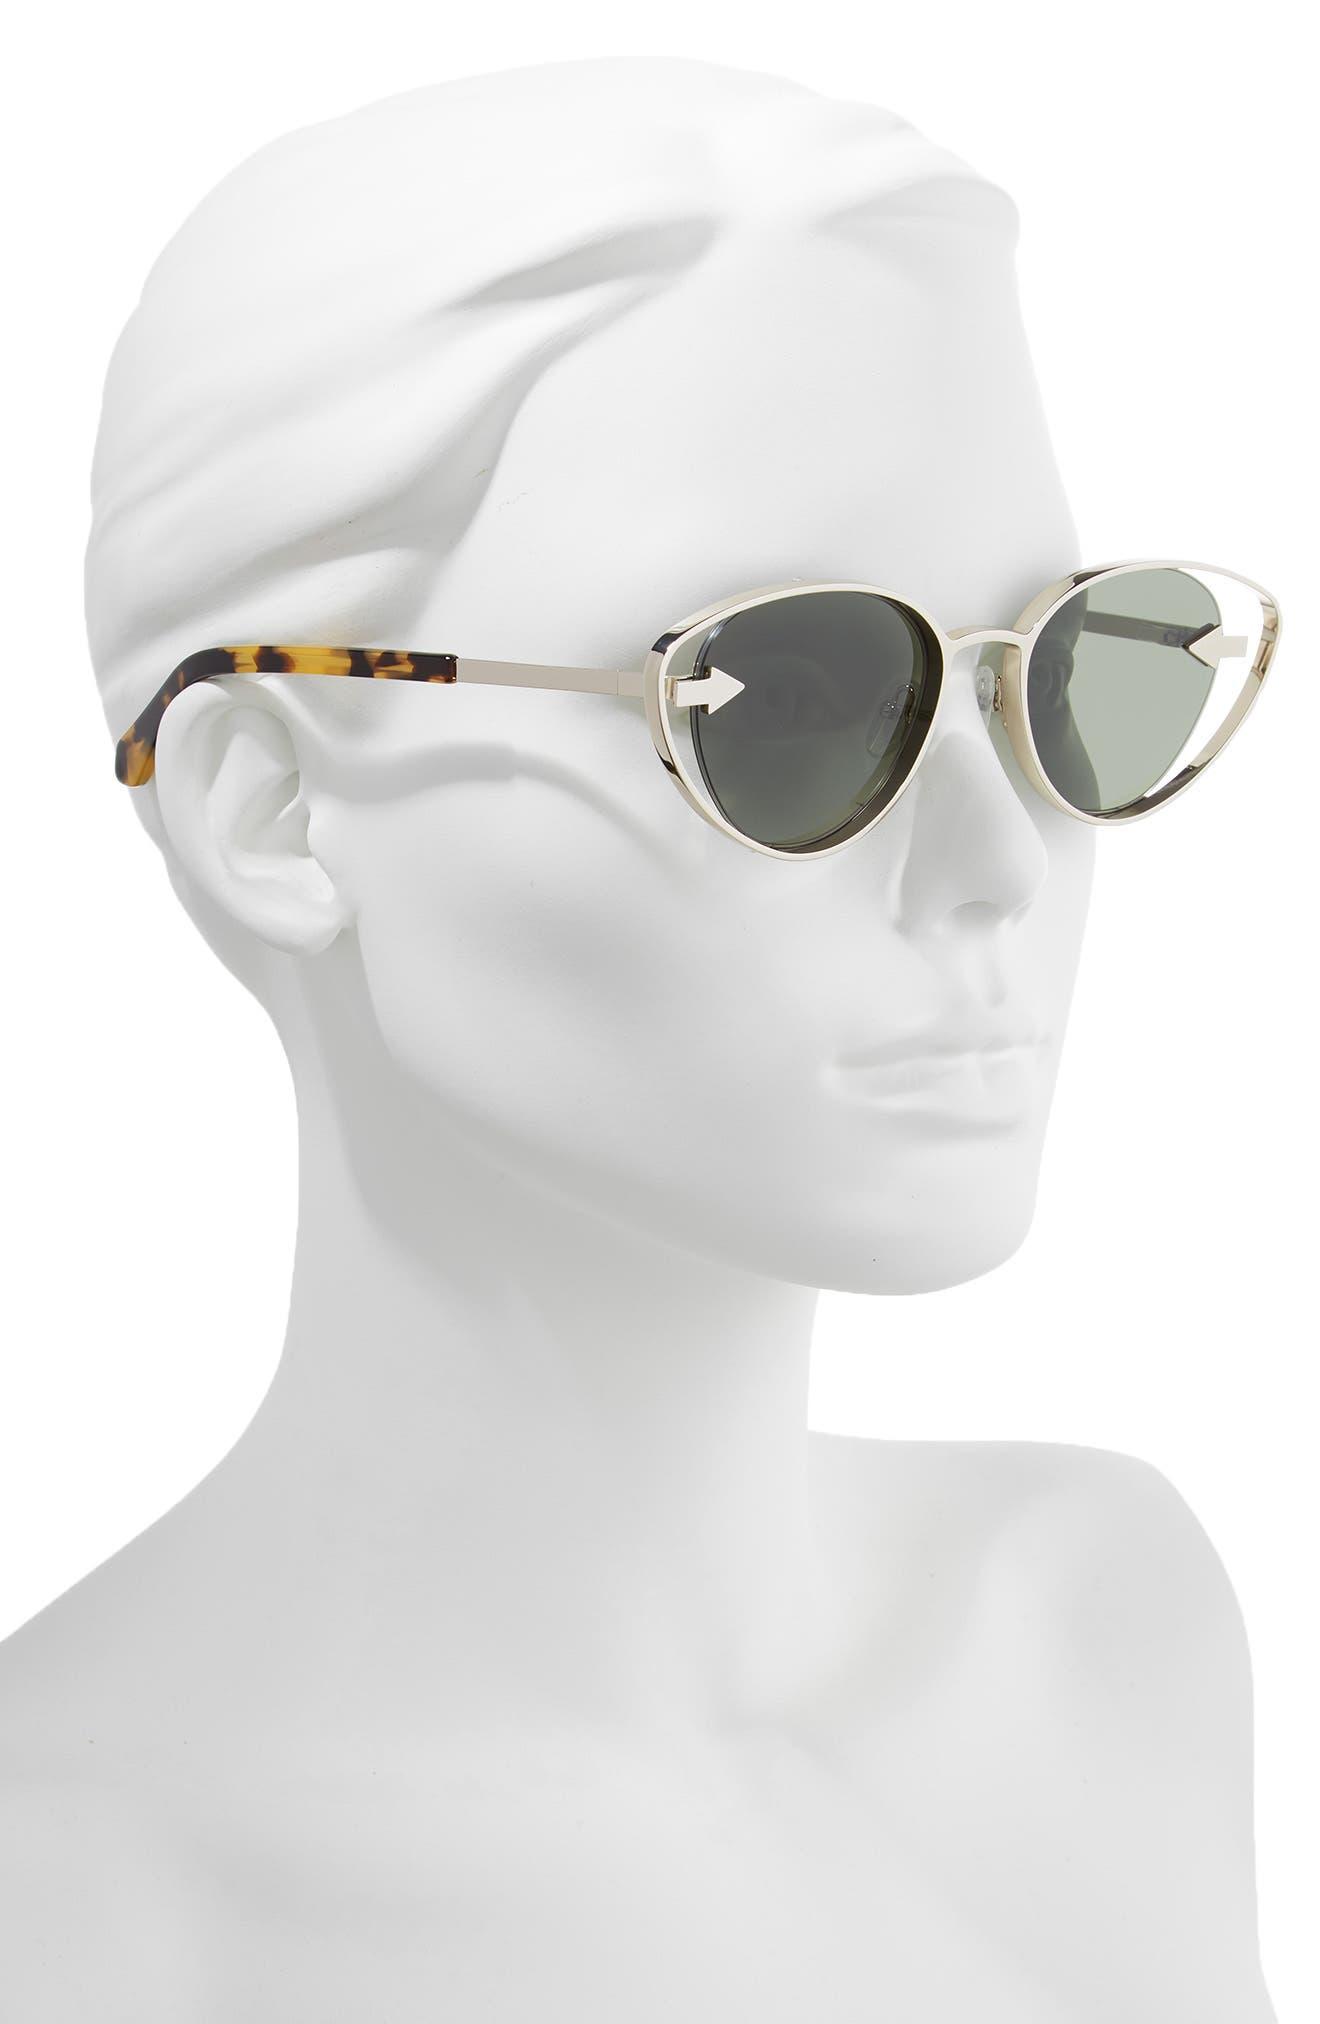 Kissy Kissy 51mm Cat Eye Sunglasses,                             Alternate thumbnail 2, color,                             GOLD/ TORTOISE